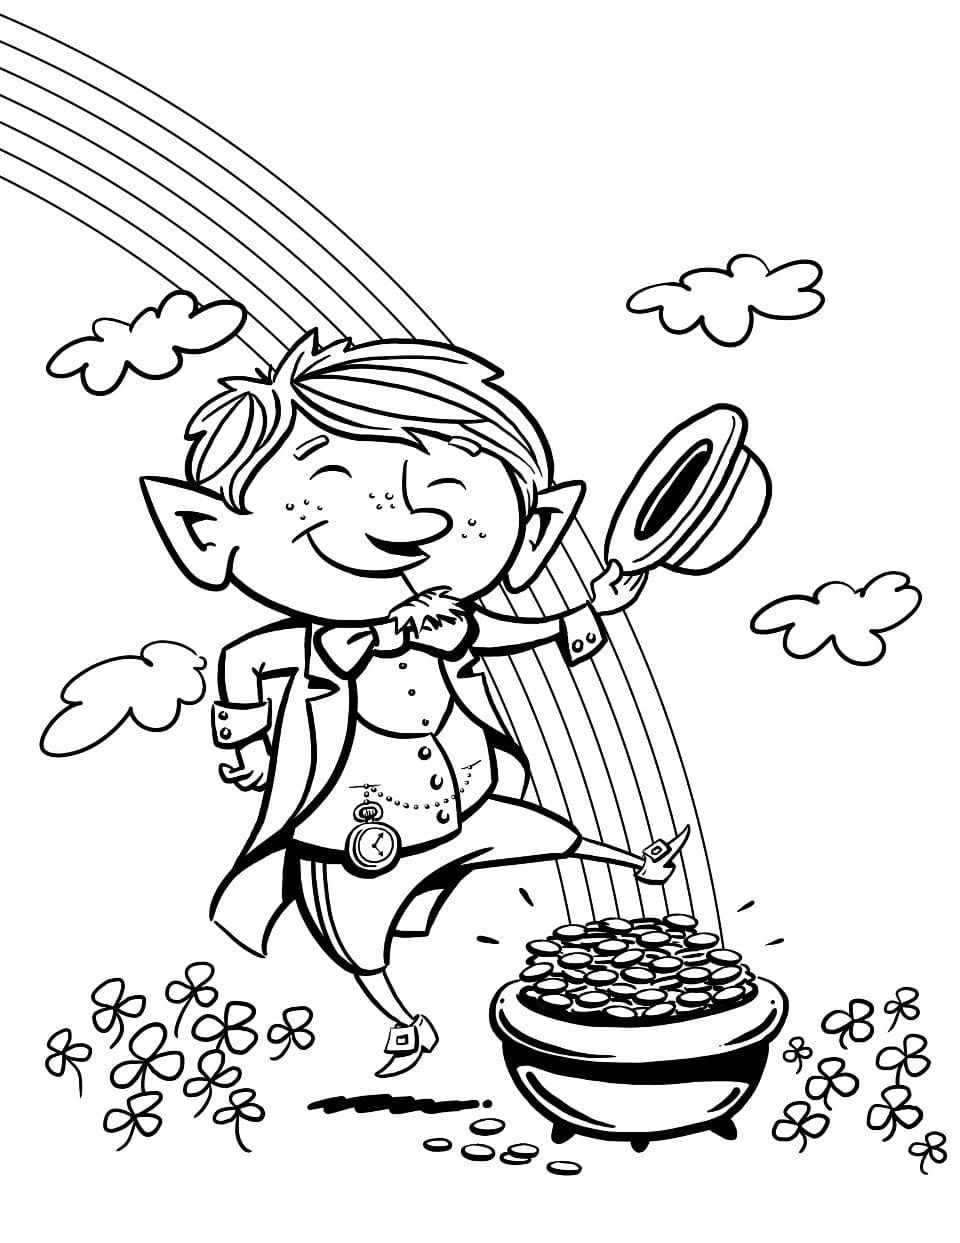 Leprechaun Coloring Pages Best Coloring Pages For Kids Leprechaun